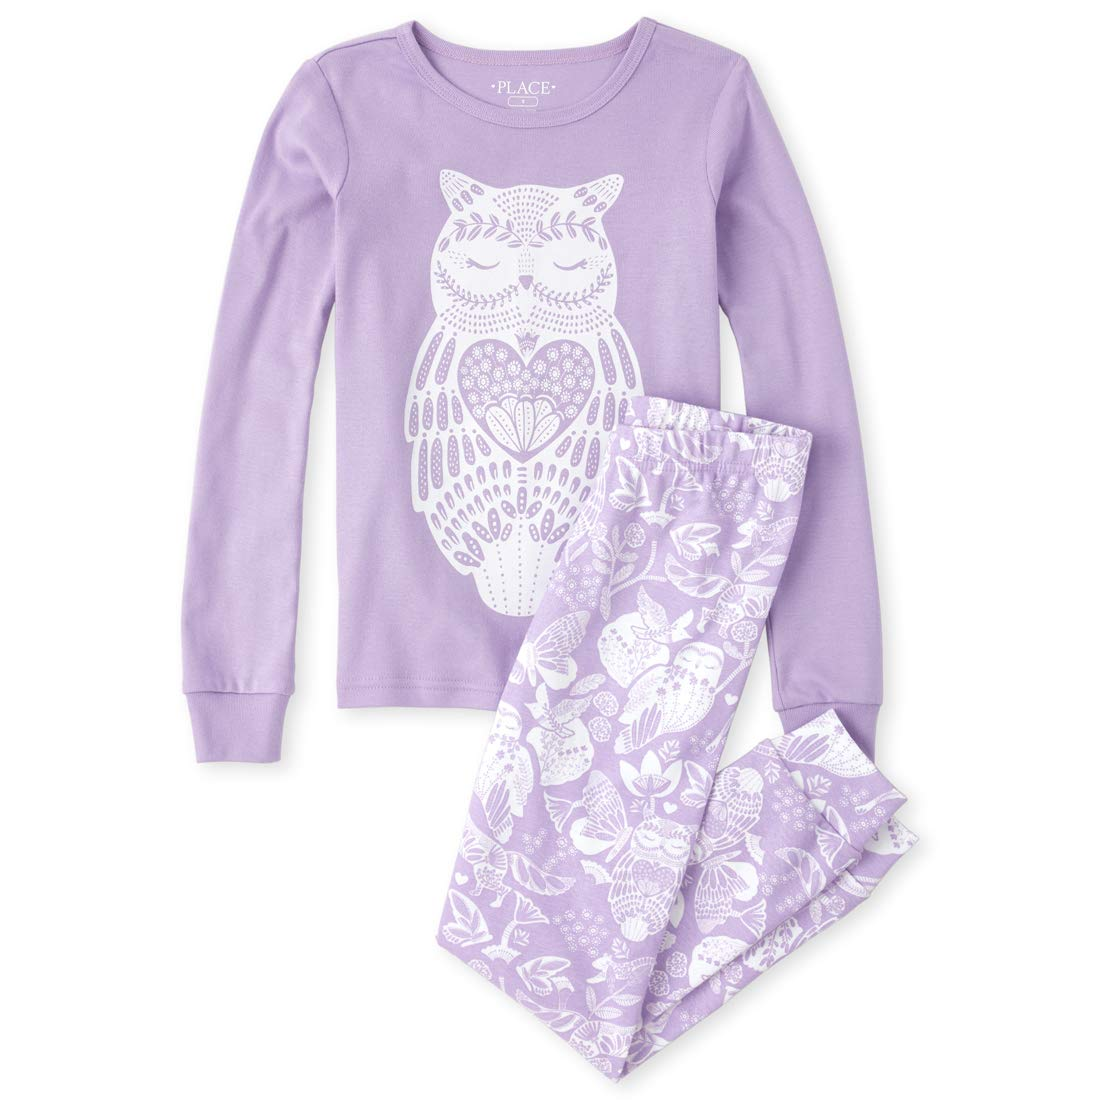 The Childrens Place Girls Big Long Sleeve Printed Pajama Pant Set